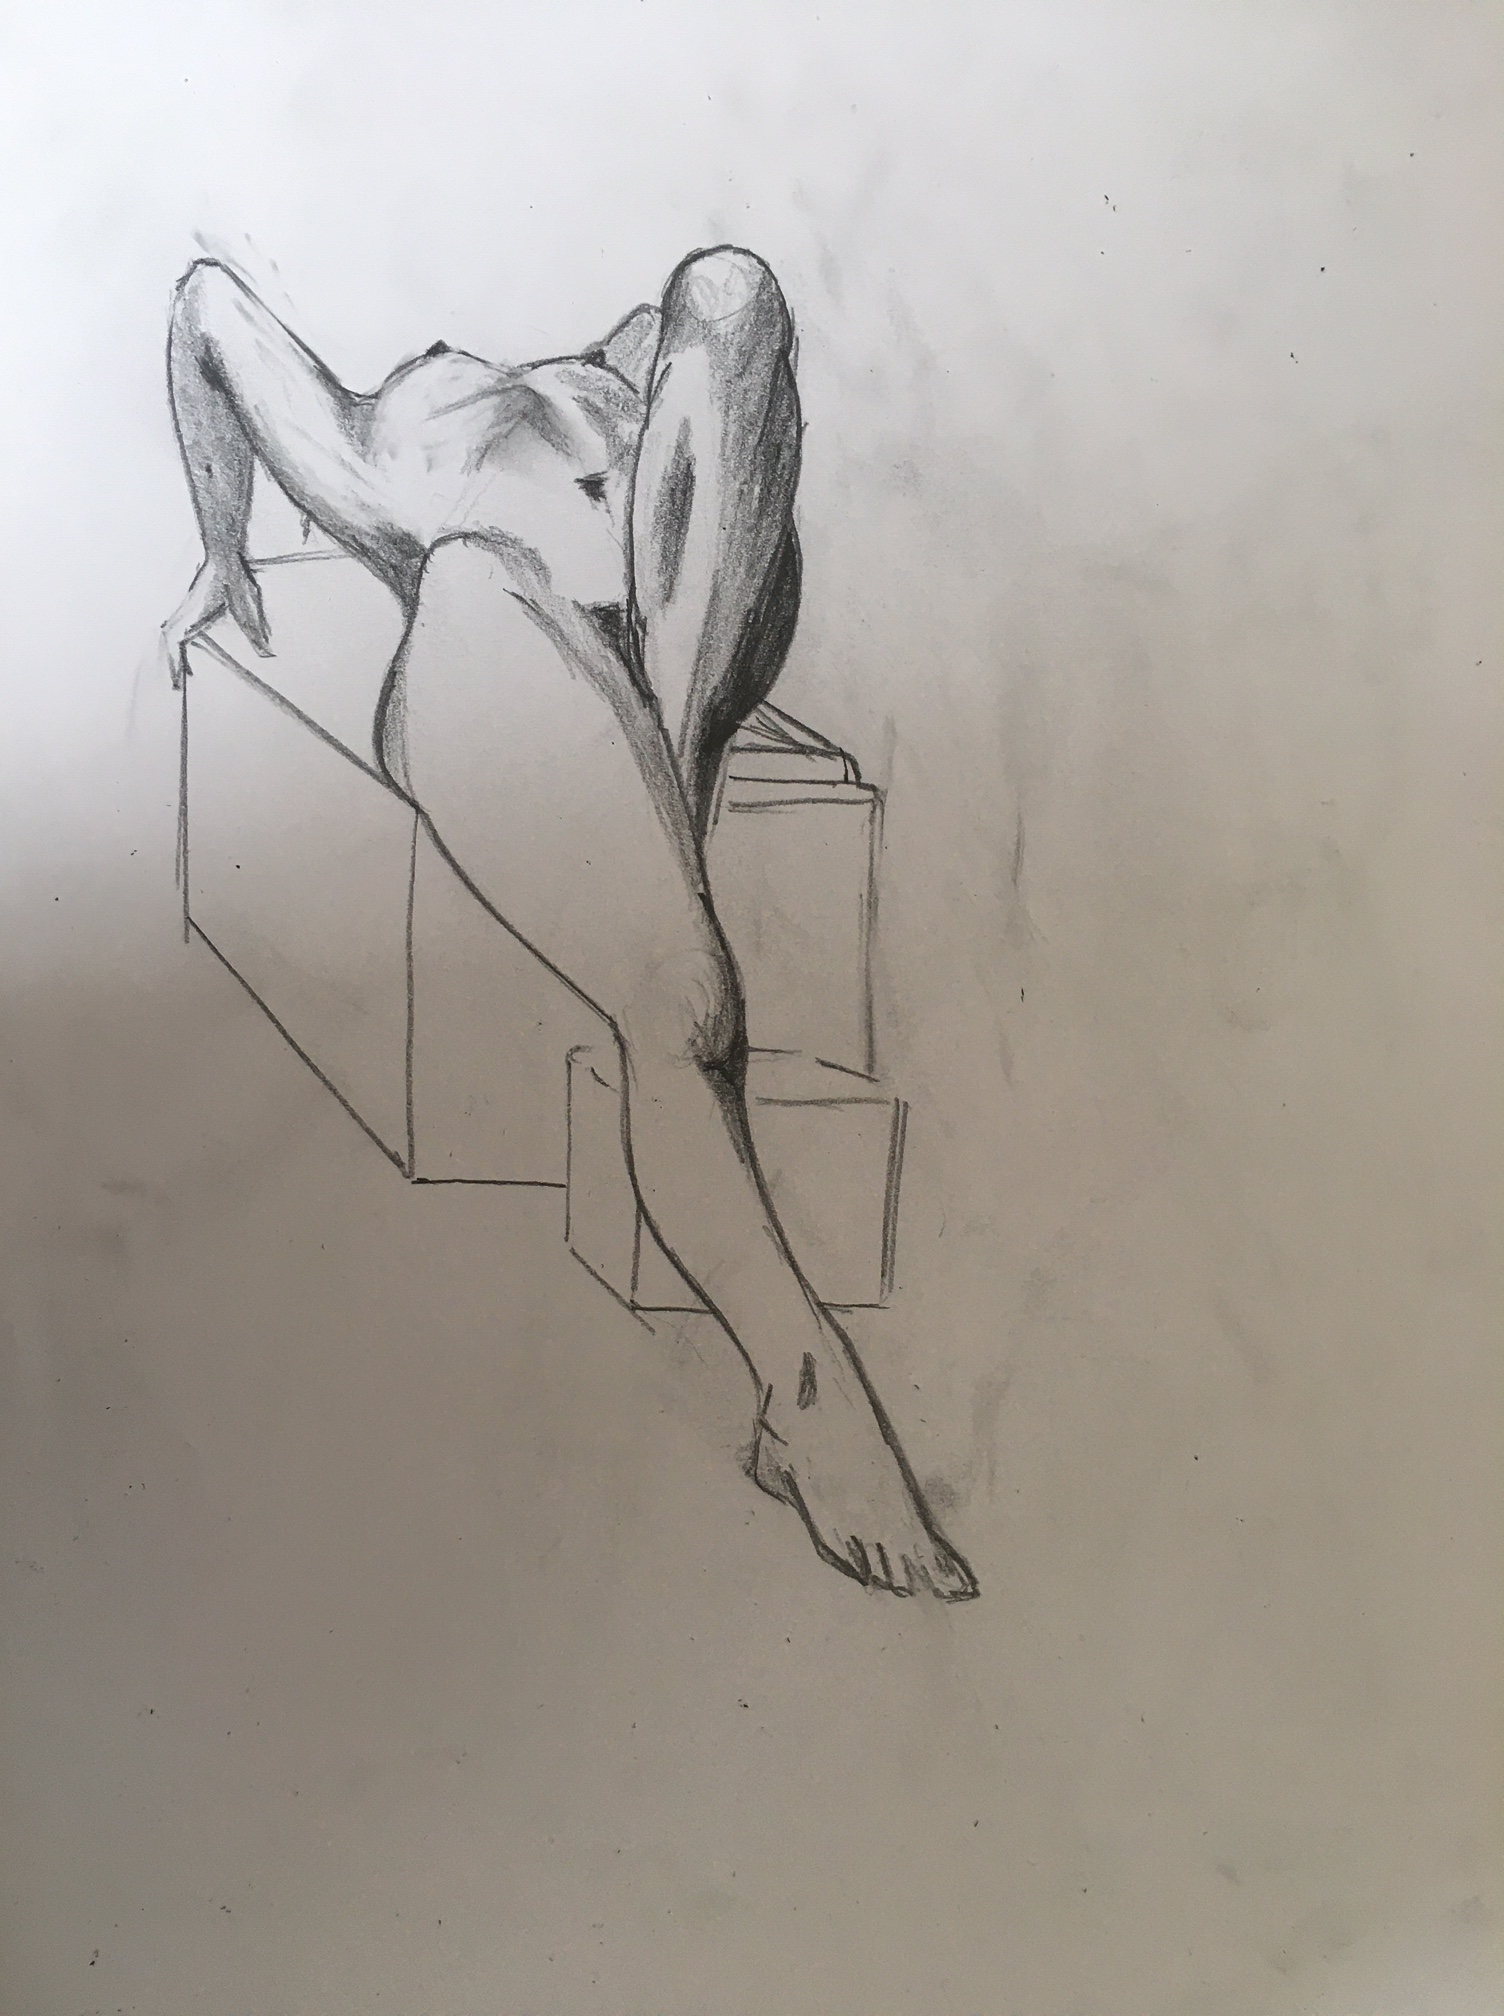 Dessin raccourci allong� dessin en ligne   cours de dessin